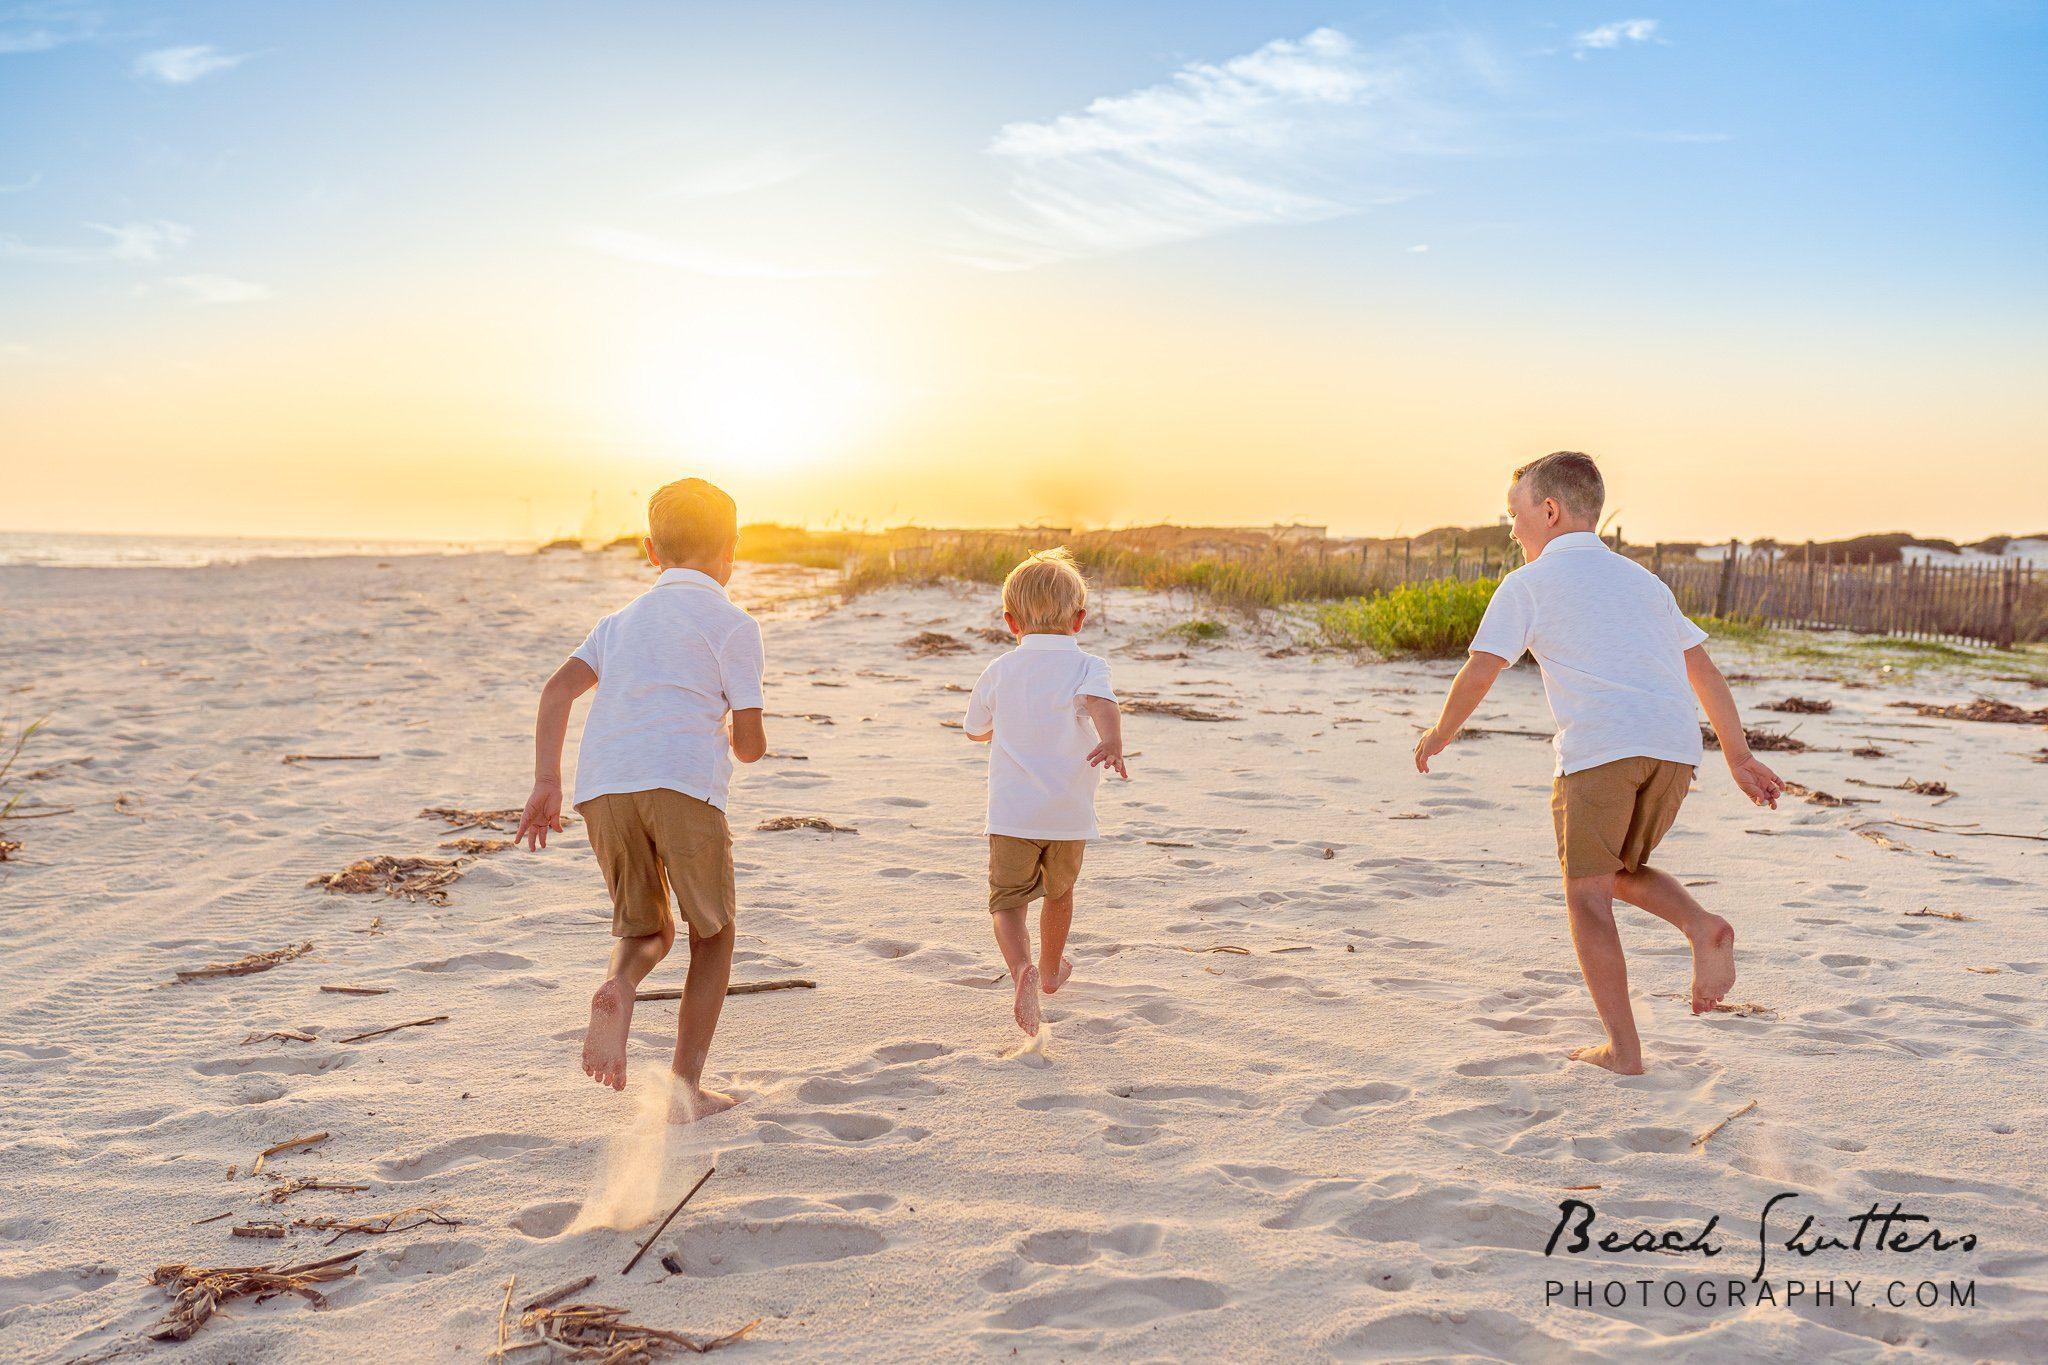 resort photos in Gulf Shores